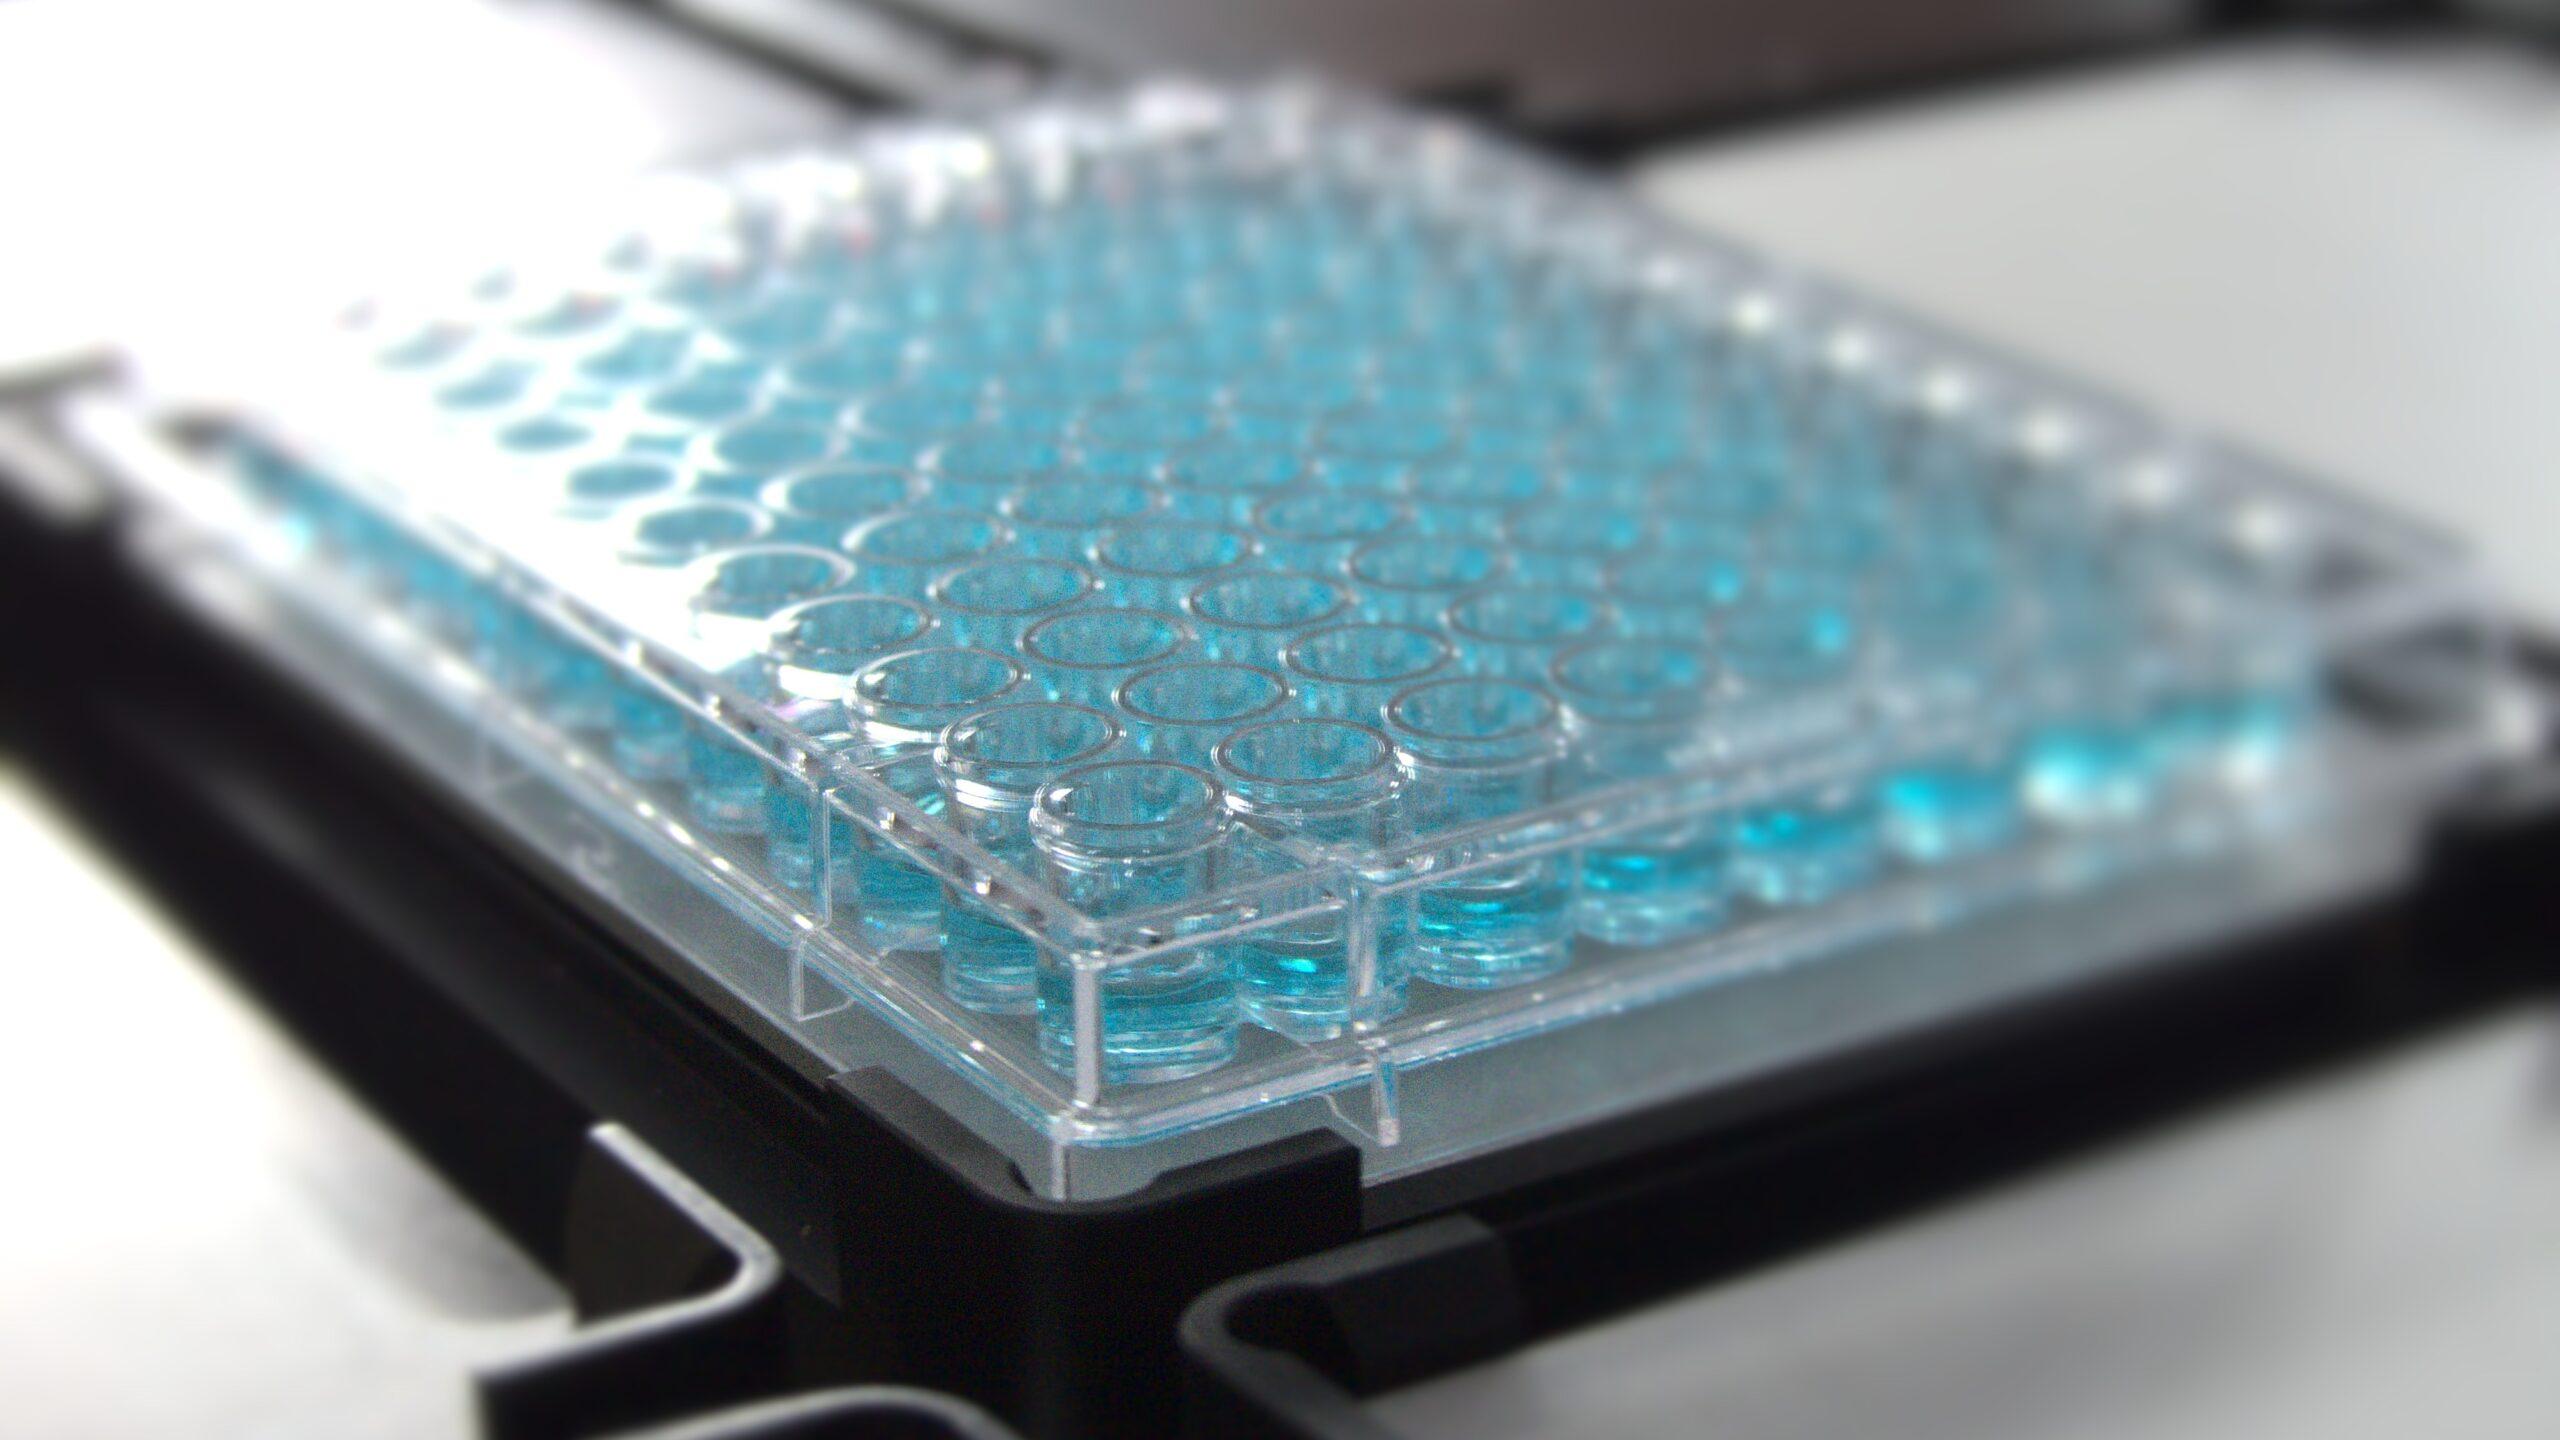 blurry plate - lab equipment